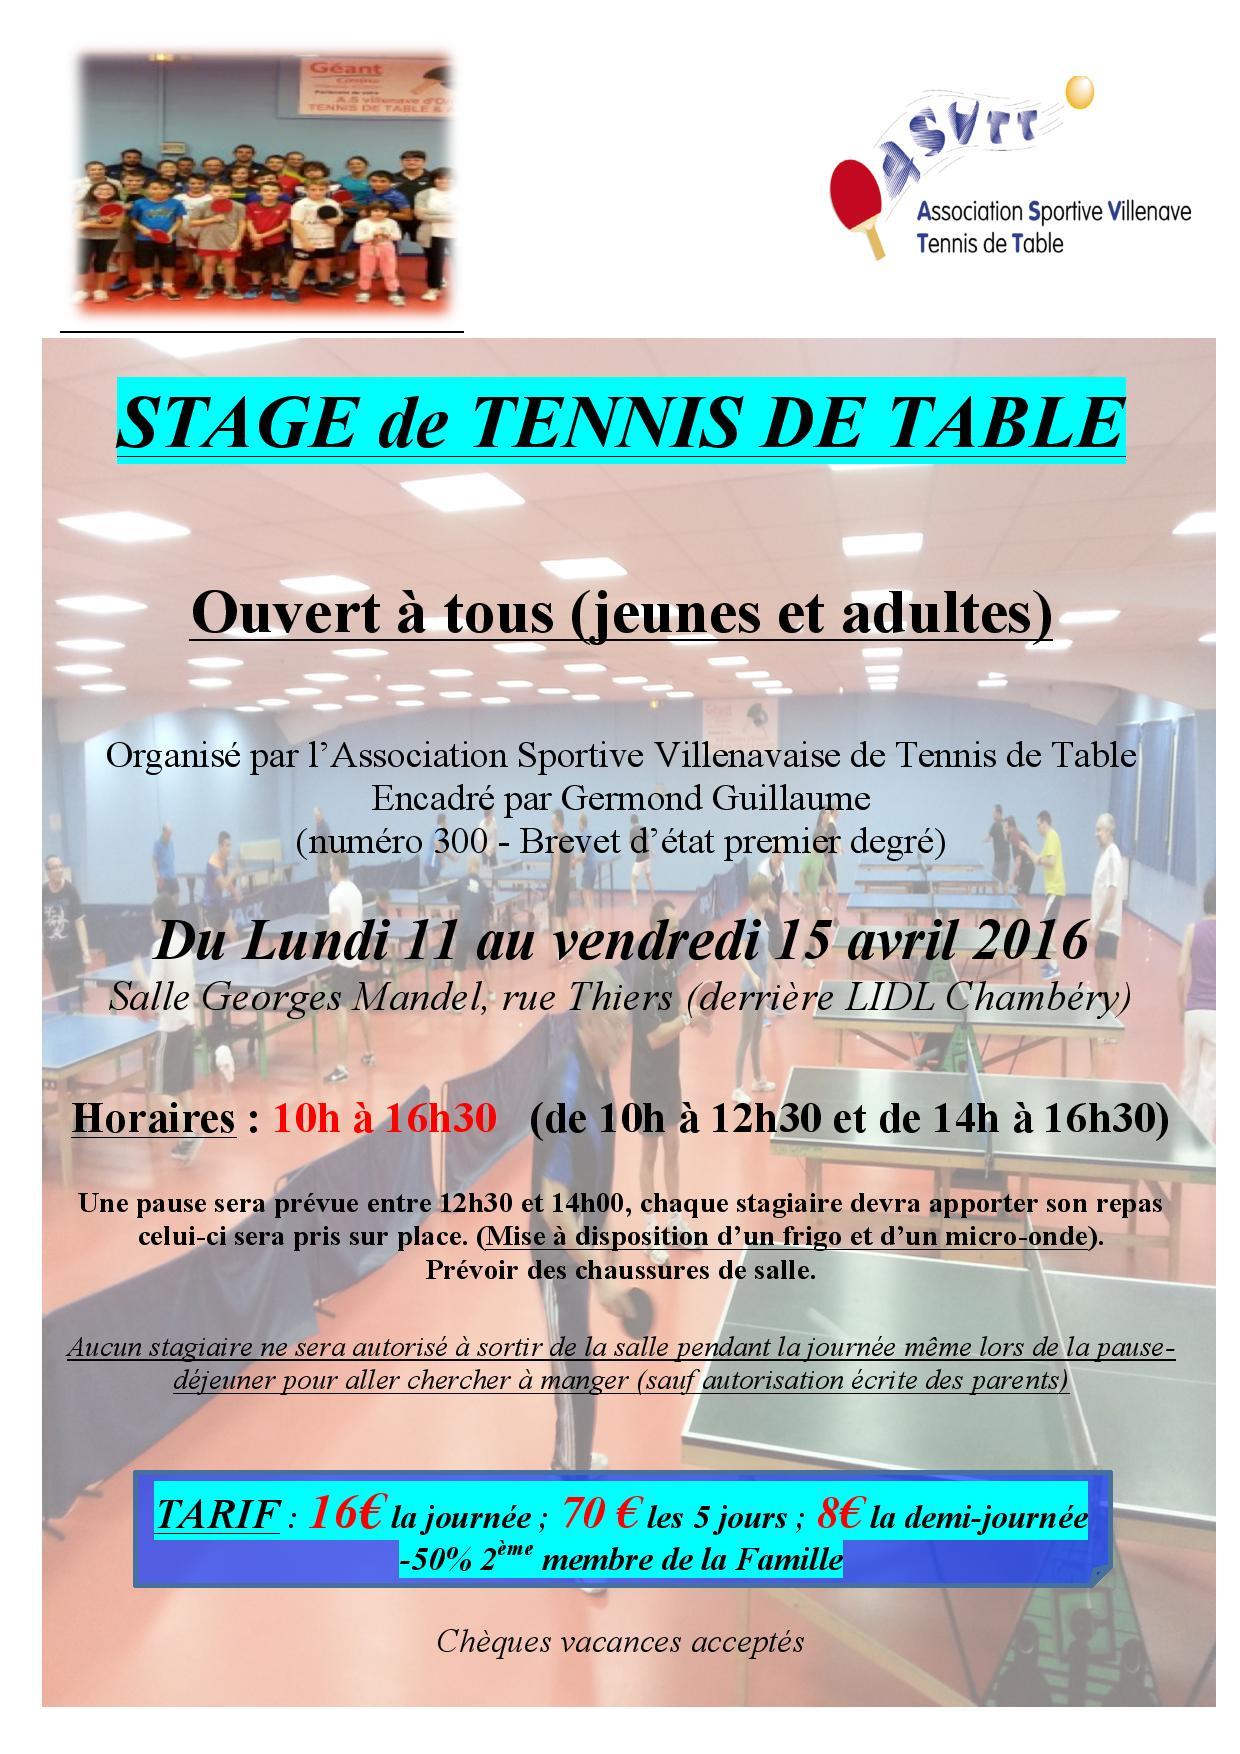 asvtt_Stage Avril 2016 1-page-001